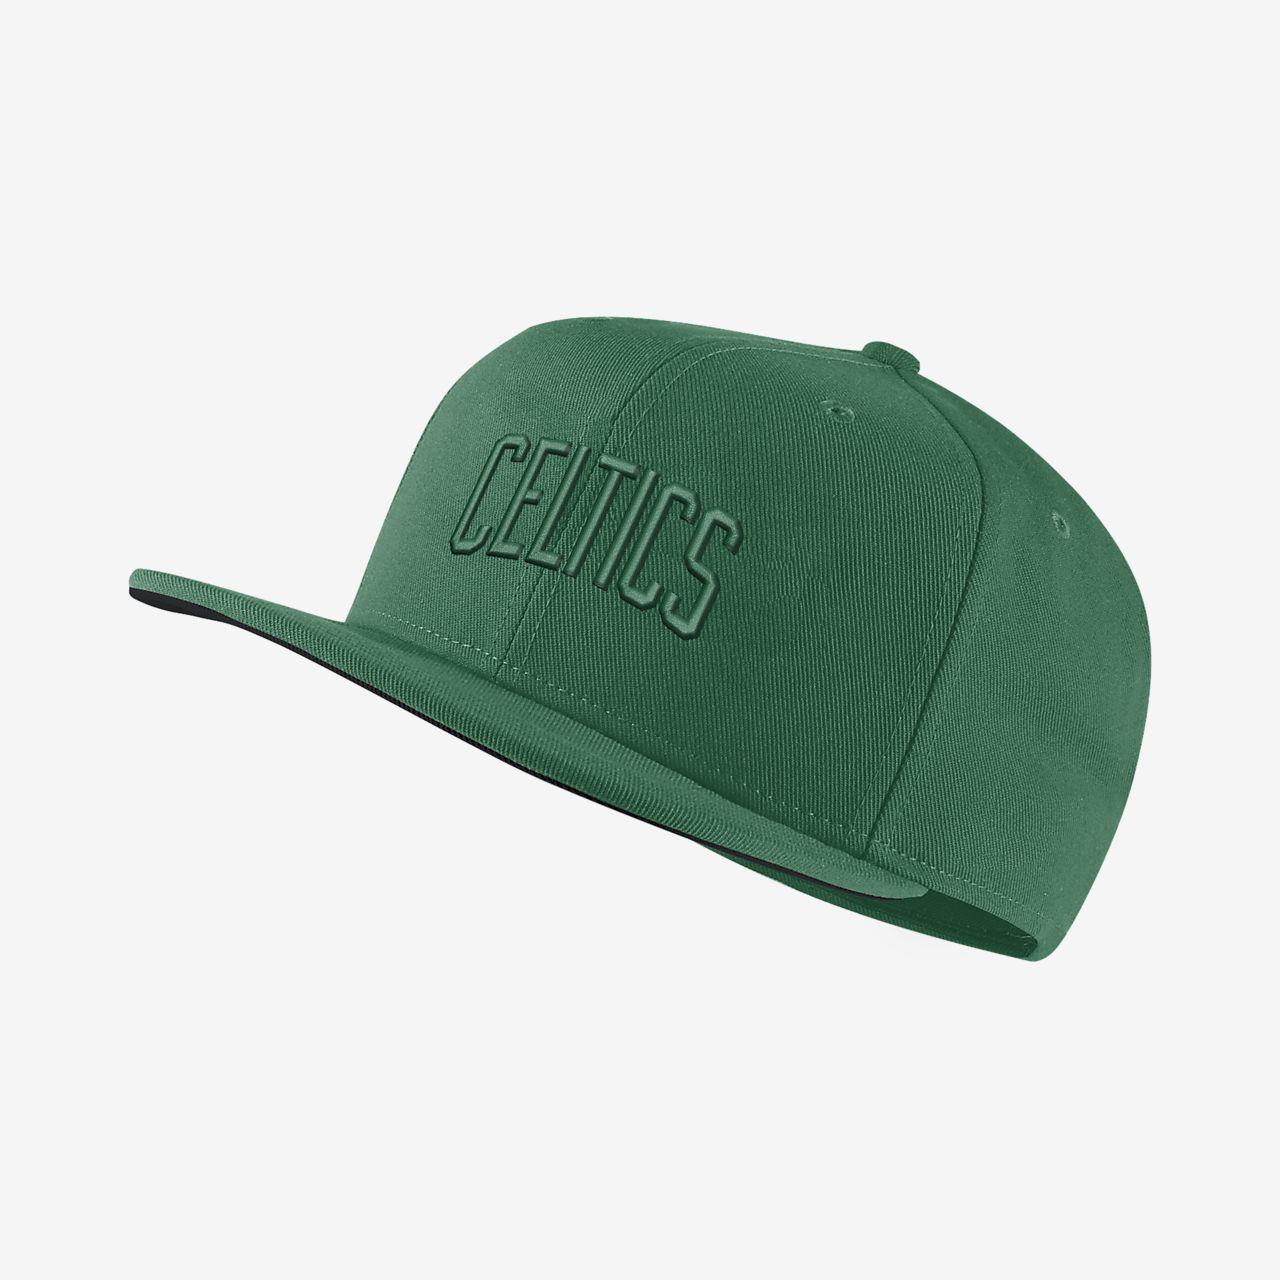 Czapka NBA Boston Celtics Nike AeroBill